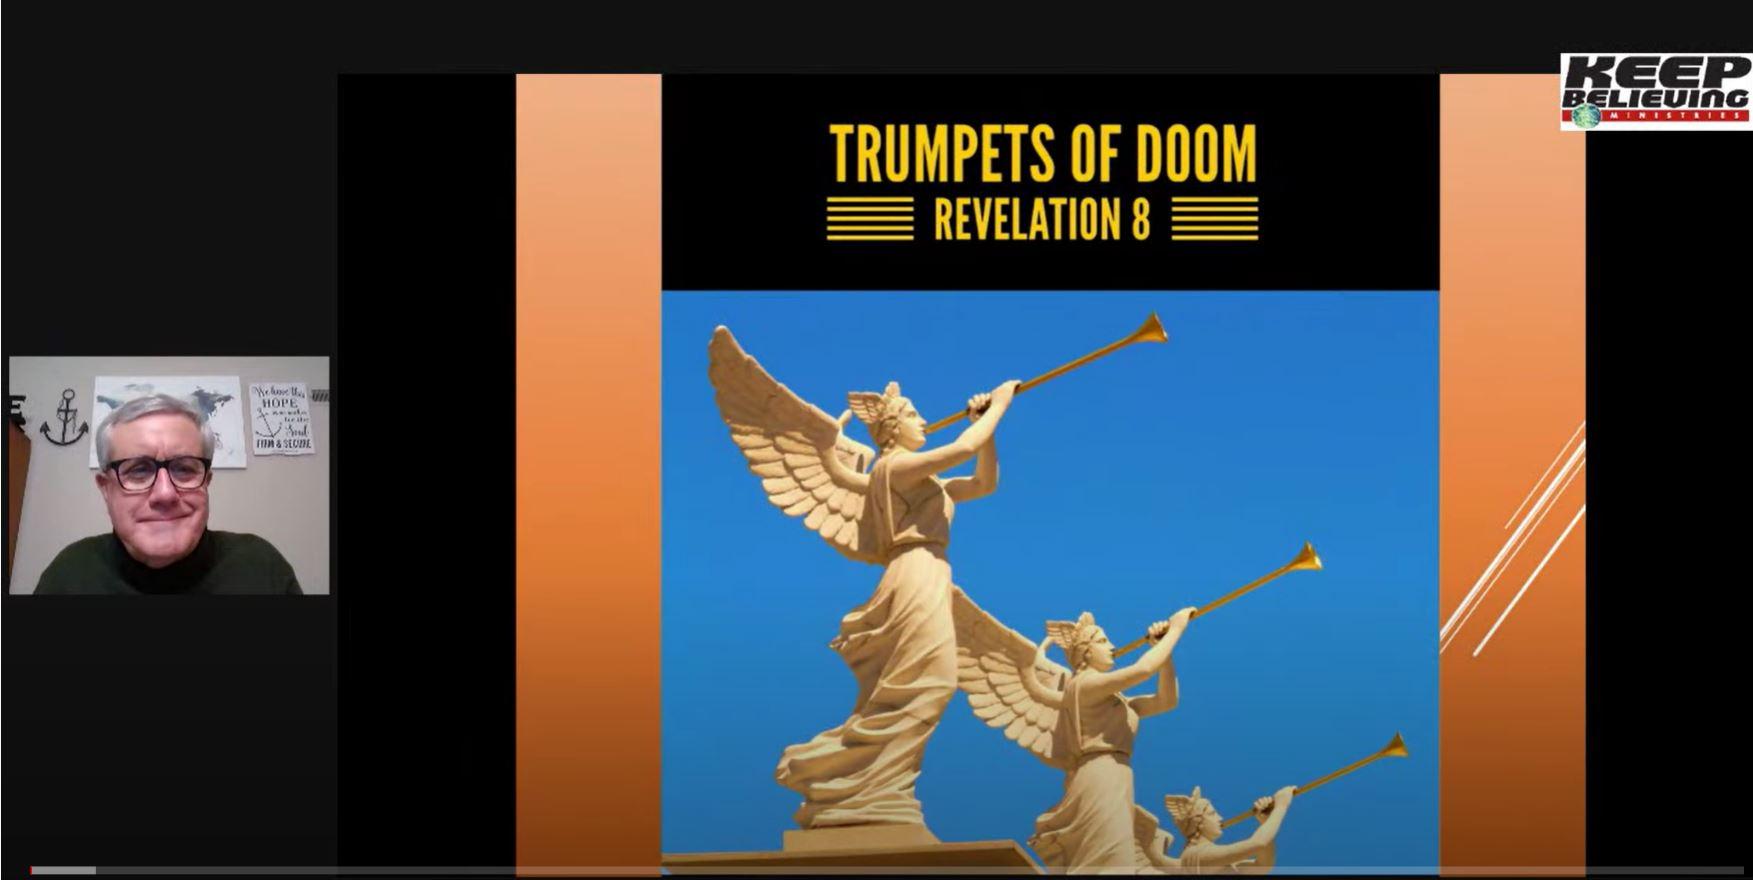 Trumpets of Doom (Revelation 8)